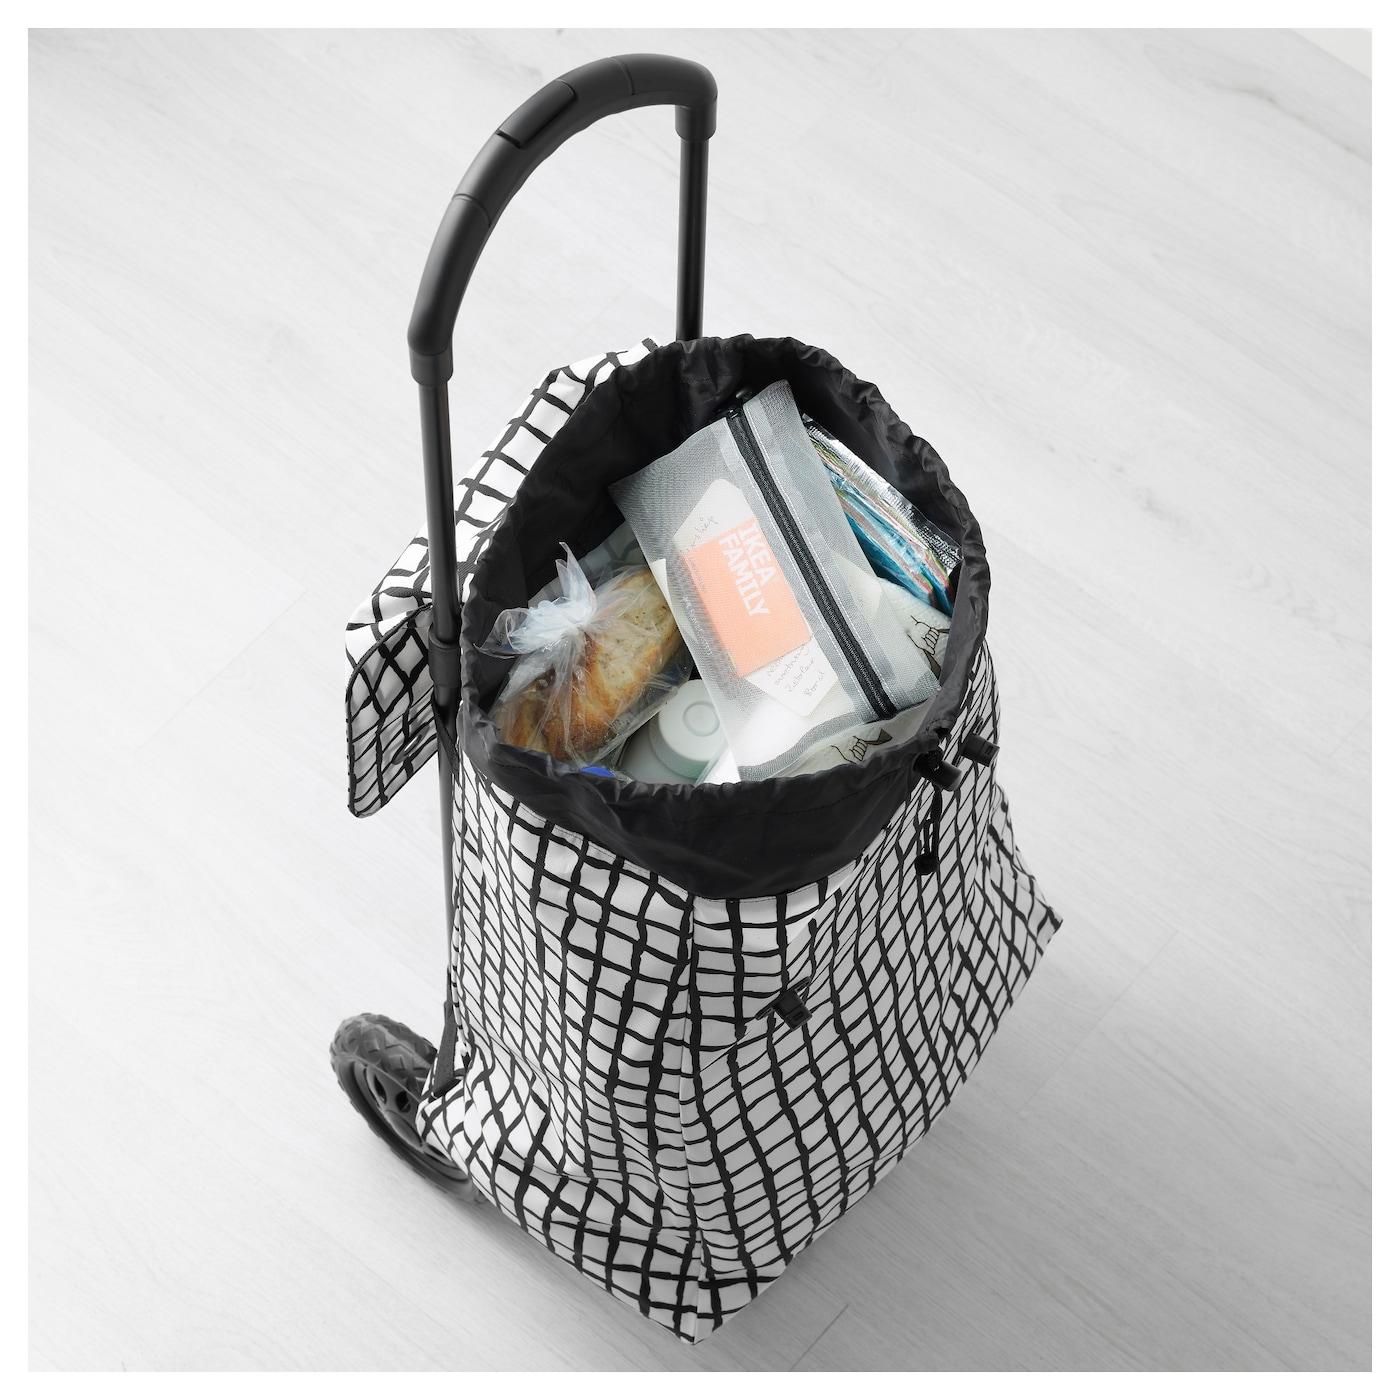 knalla shopping bag on wheels black white ikea. Black Bedroom Furniture Sets. Home Design Ideas